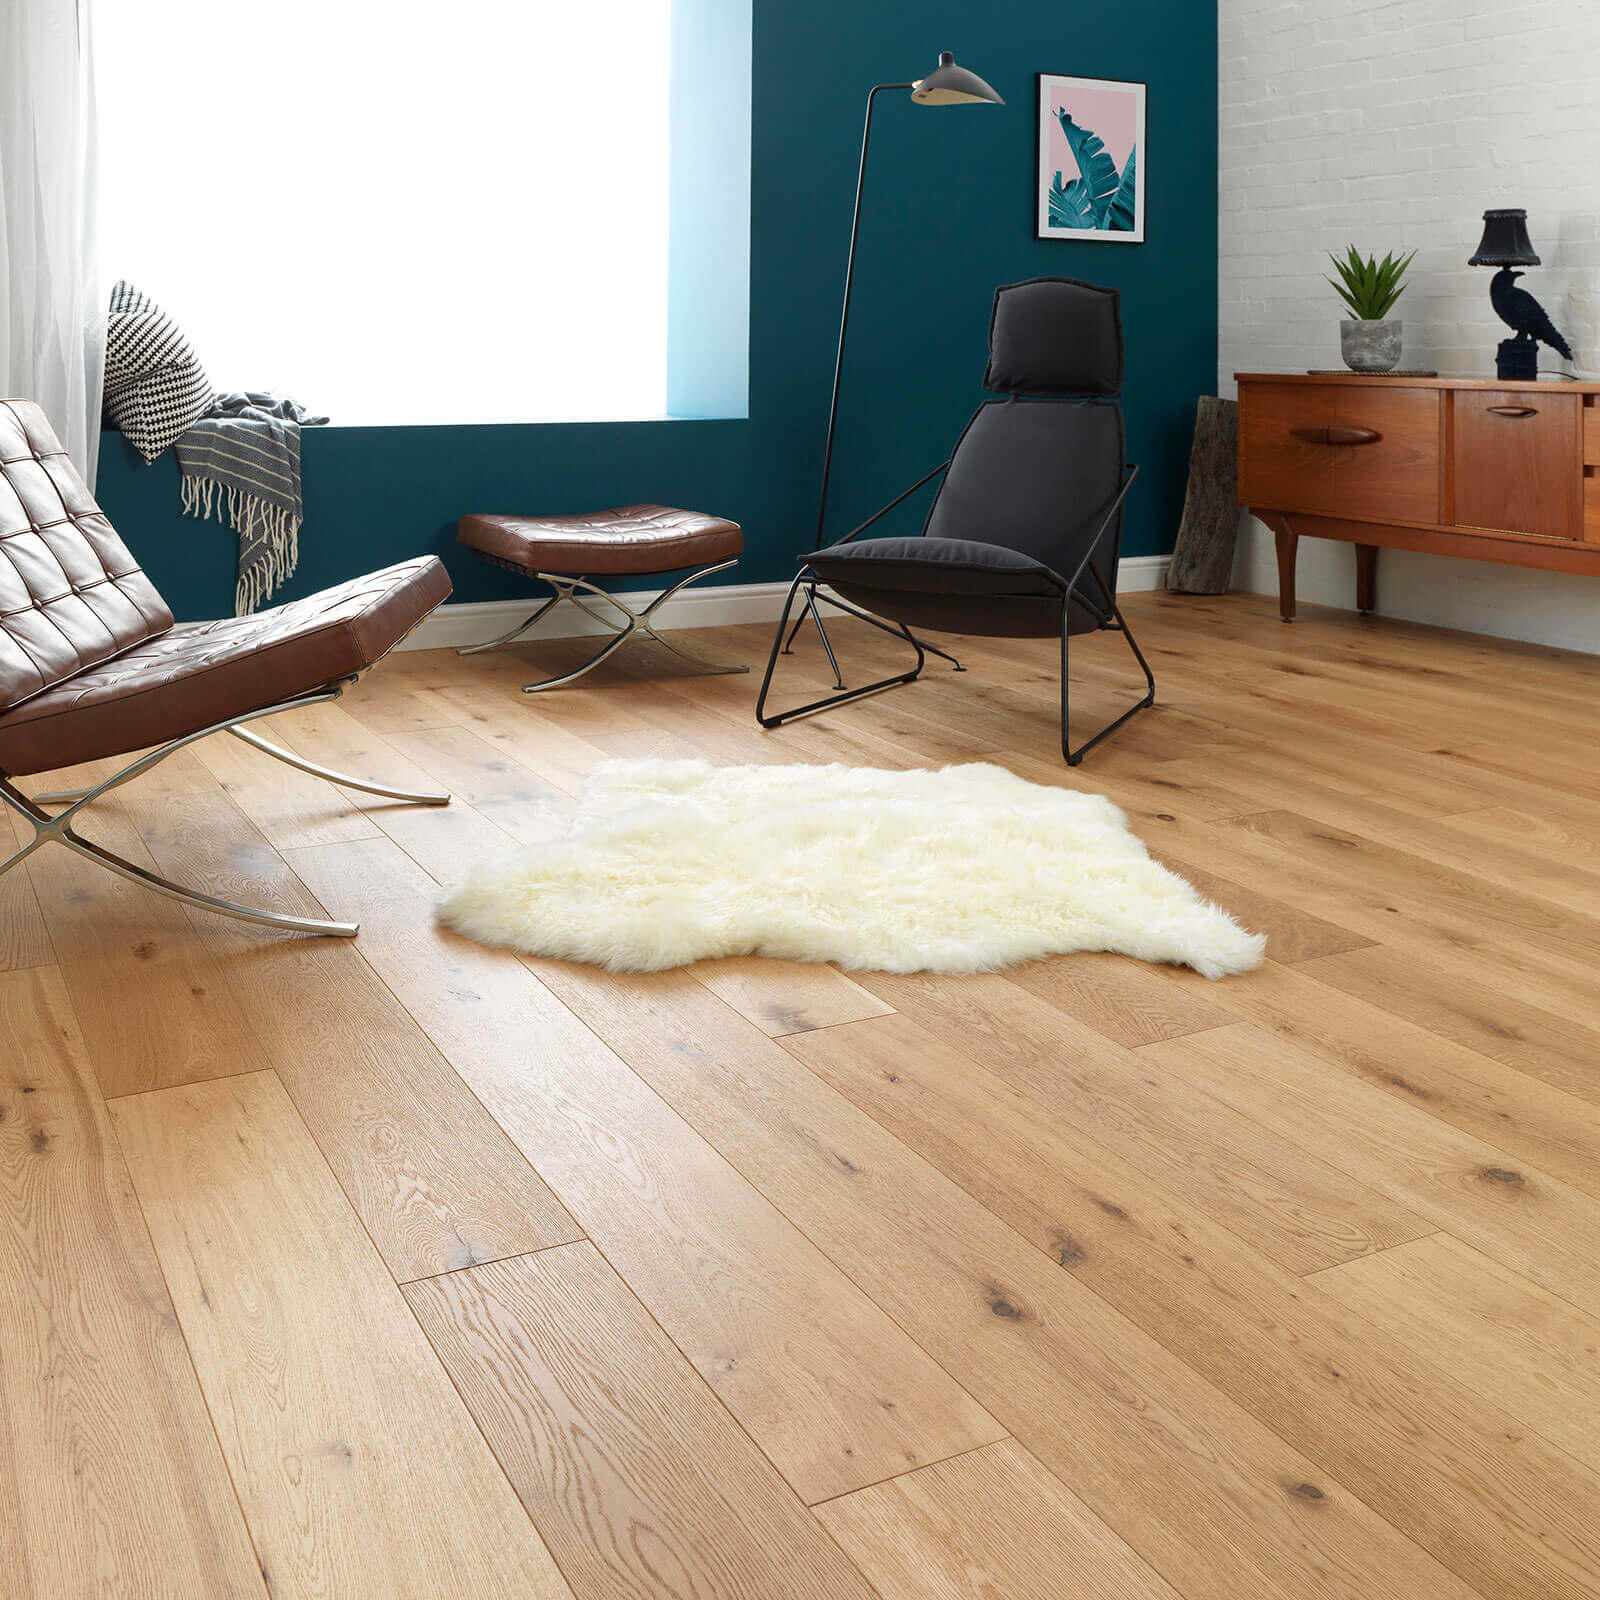 Oak Rustic Brushed Oiled Oak Chepstow Woodpecker Flooring Lifestyle